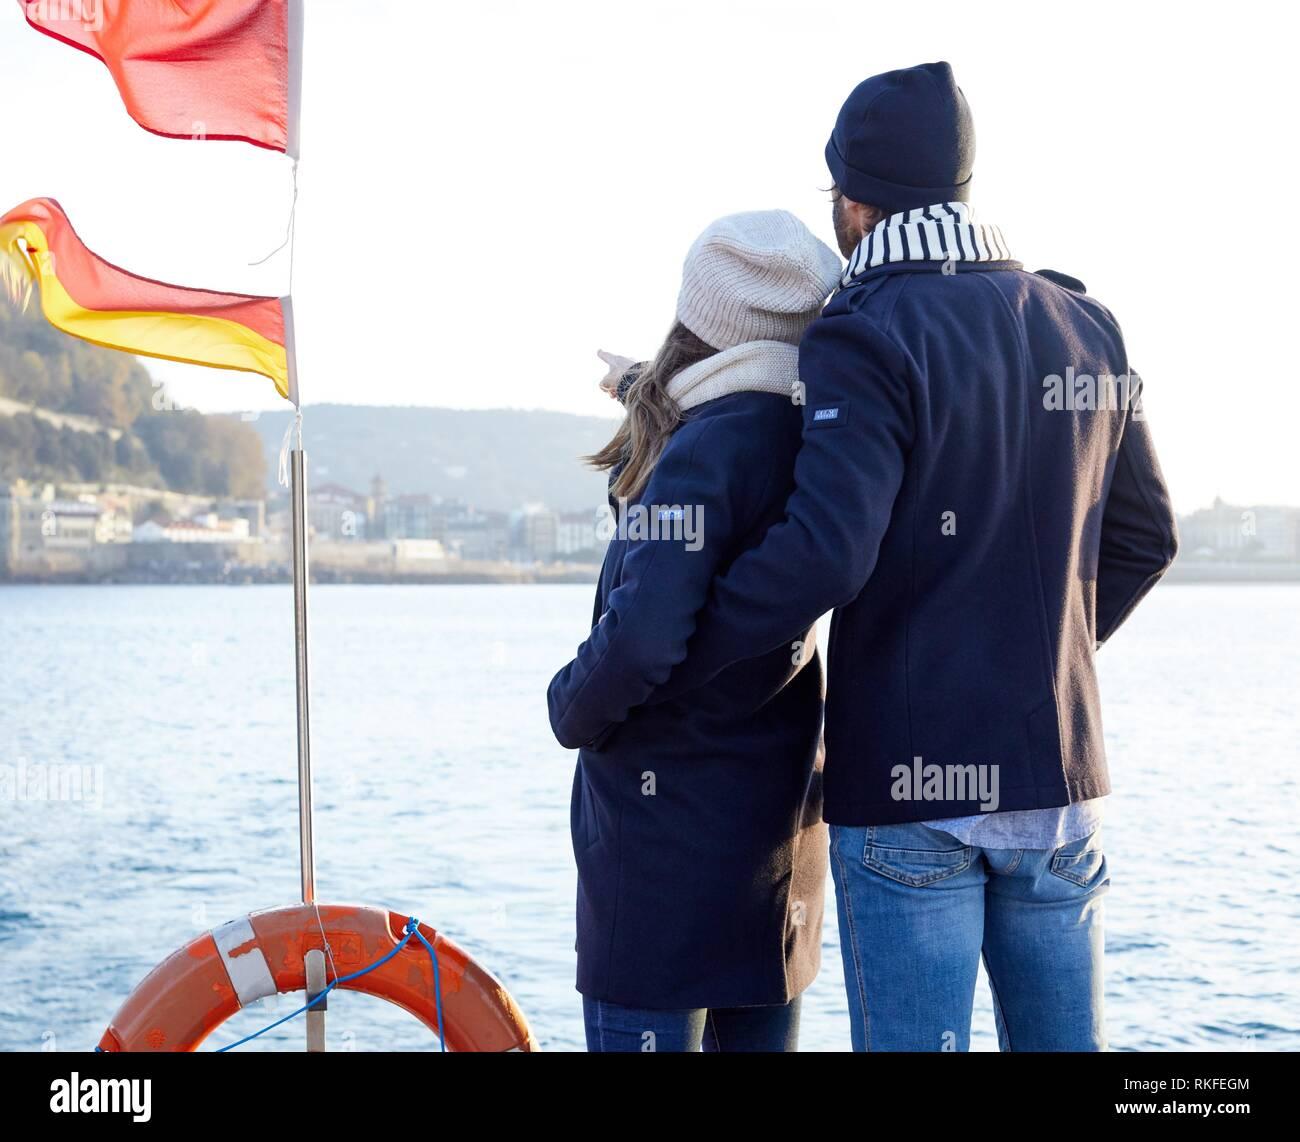 Pareja en un viaje en barco a la Isla Santa Clara, La Bahía de La Concha, Donostia, San Sebastián, Gipuzkoa, País Vasco, España, Europa, Invierno Imagen De Stock